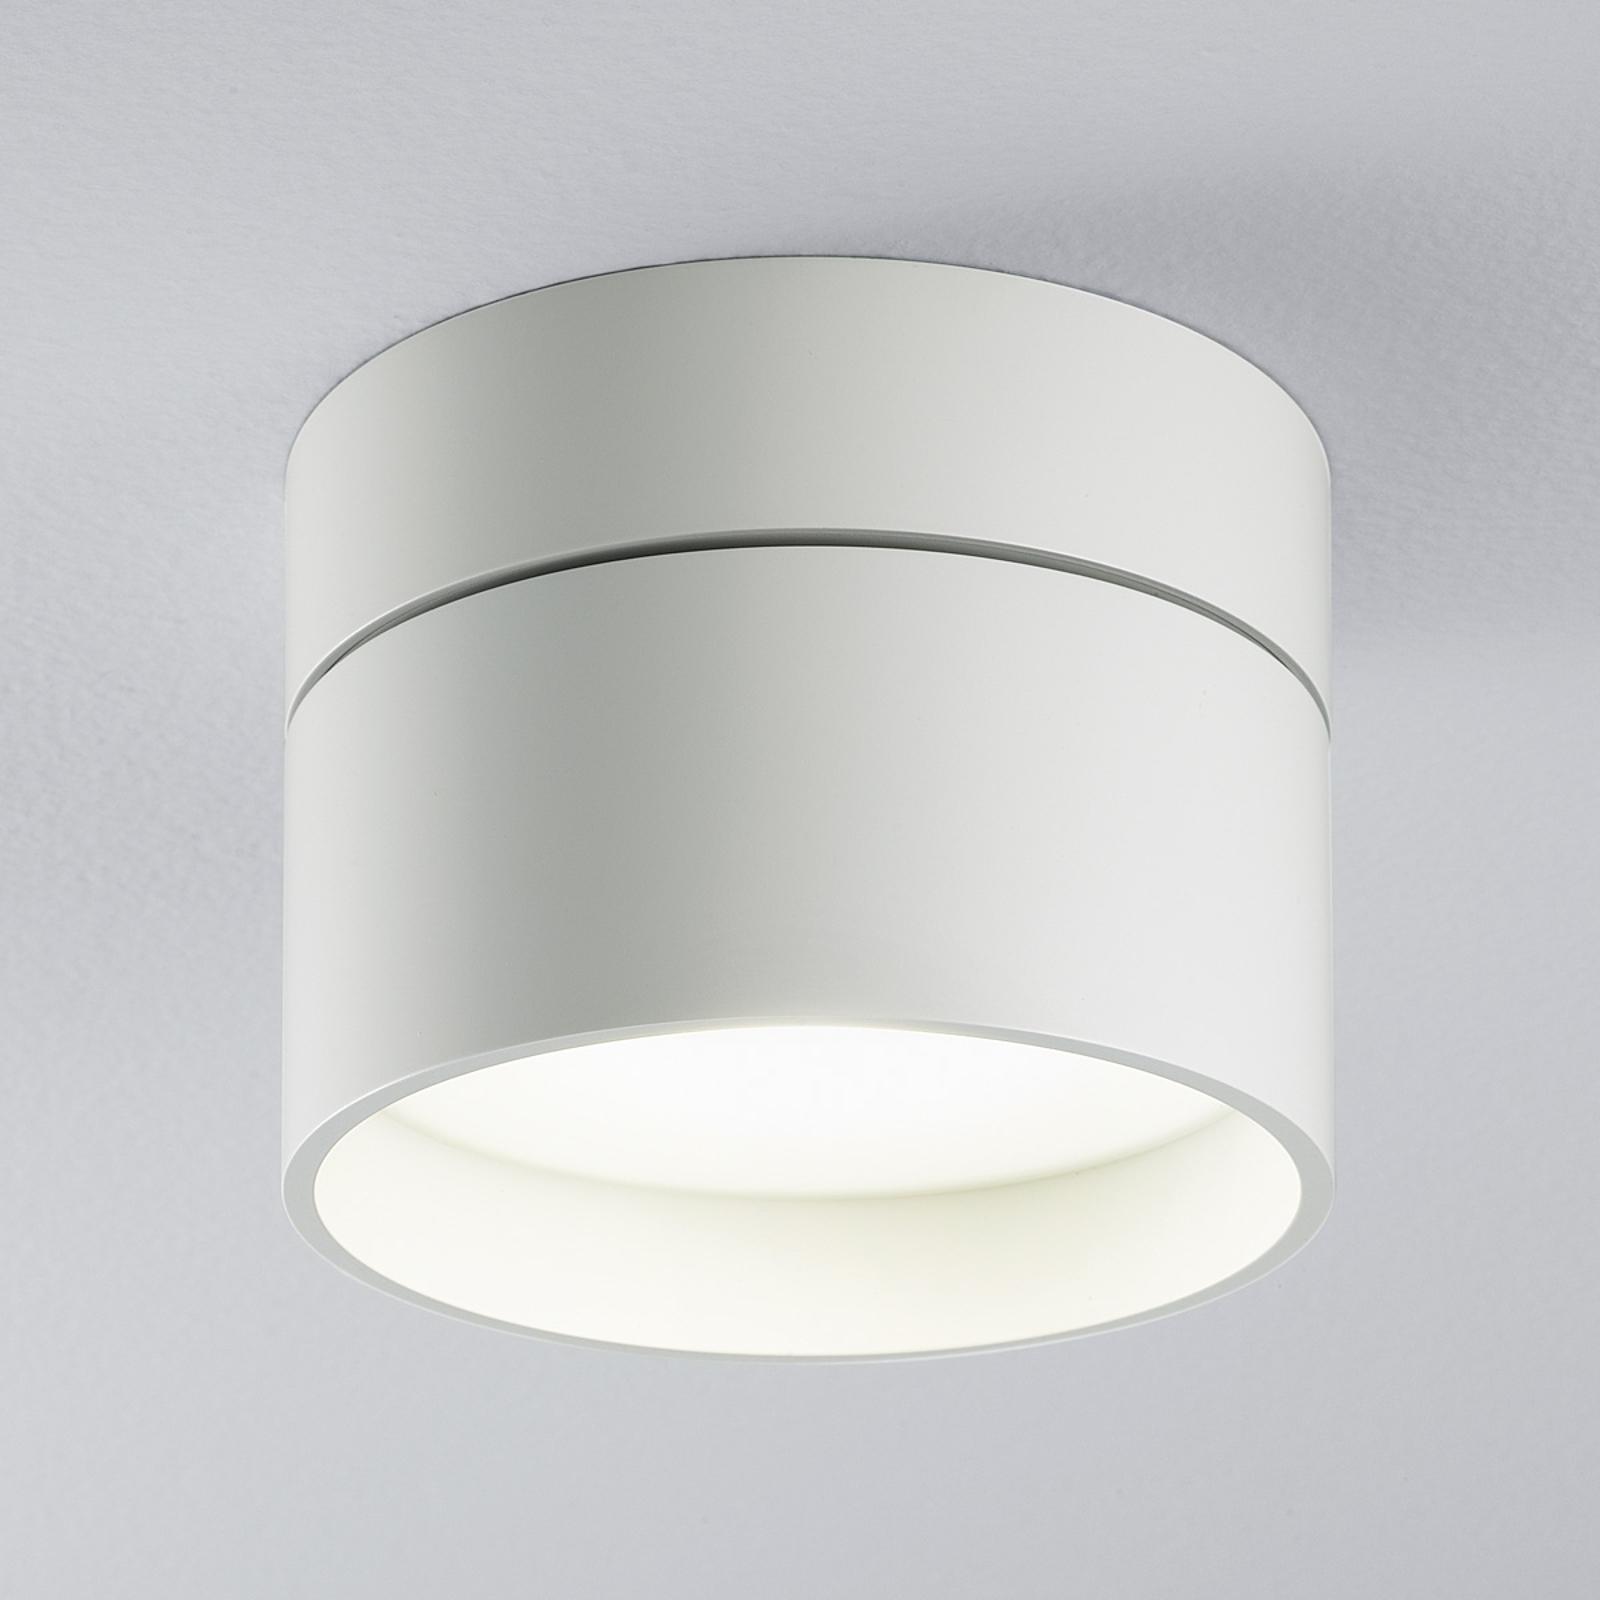 LED plafondlamp Piper, 15 cm